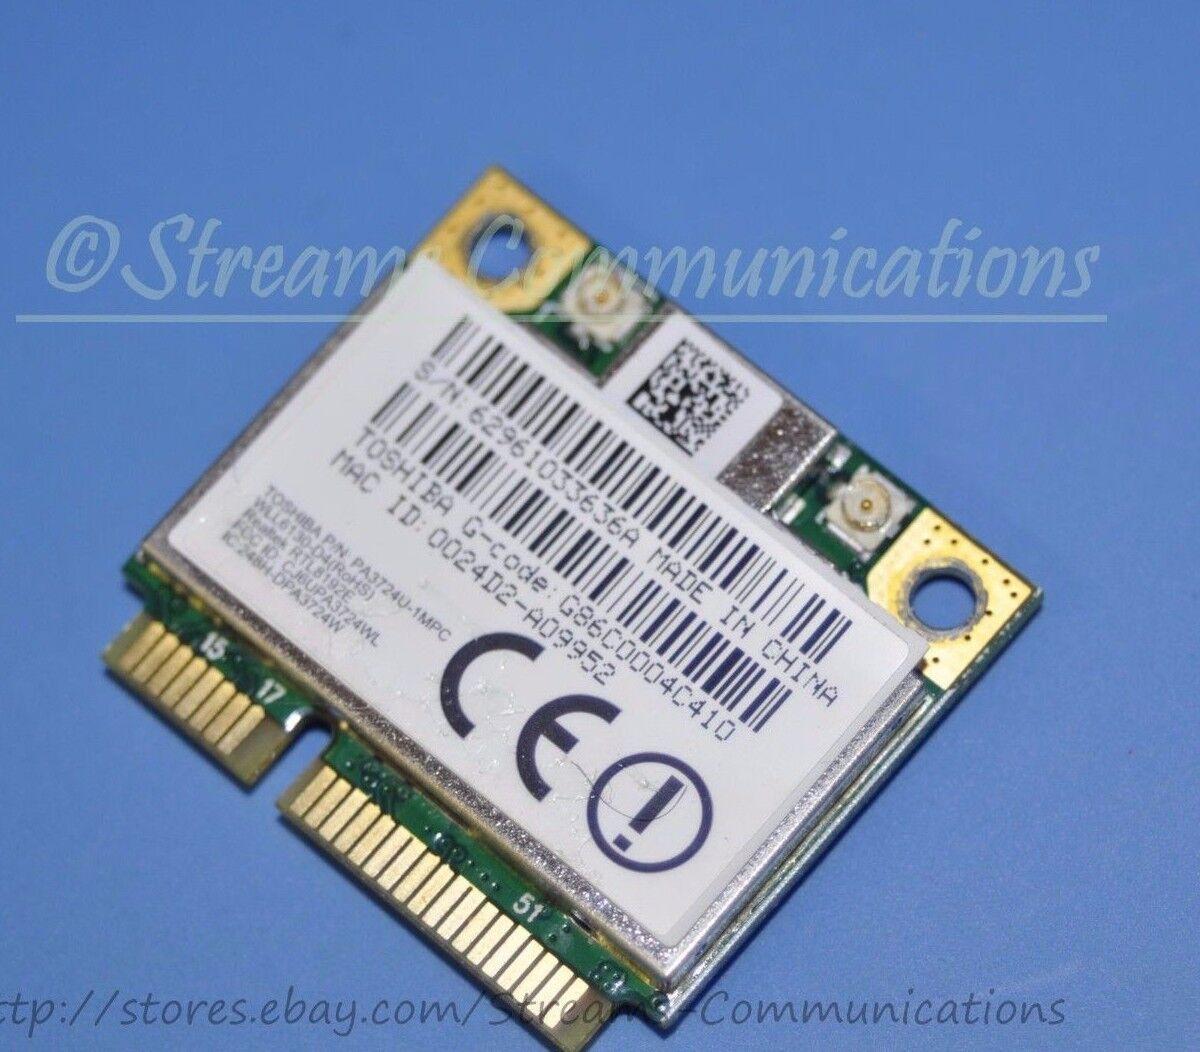 TOSHIBA Satellite L505-S5997 L505D-S5965 L505D-S5992 Laptop Wireless WiFi Card